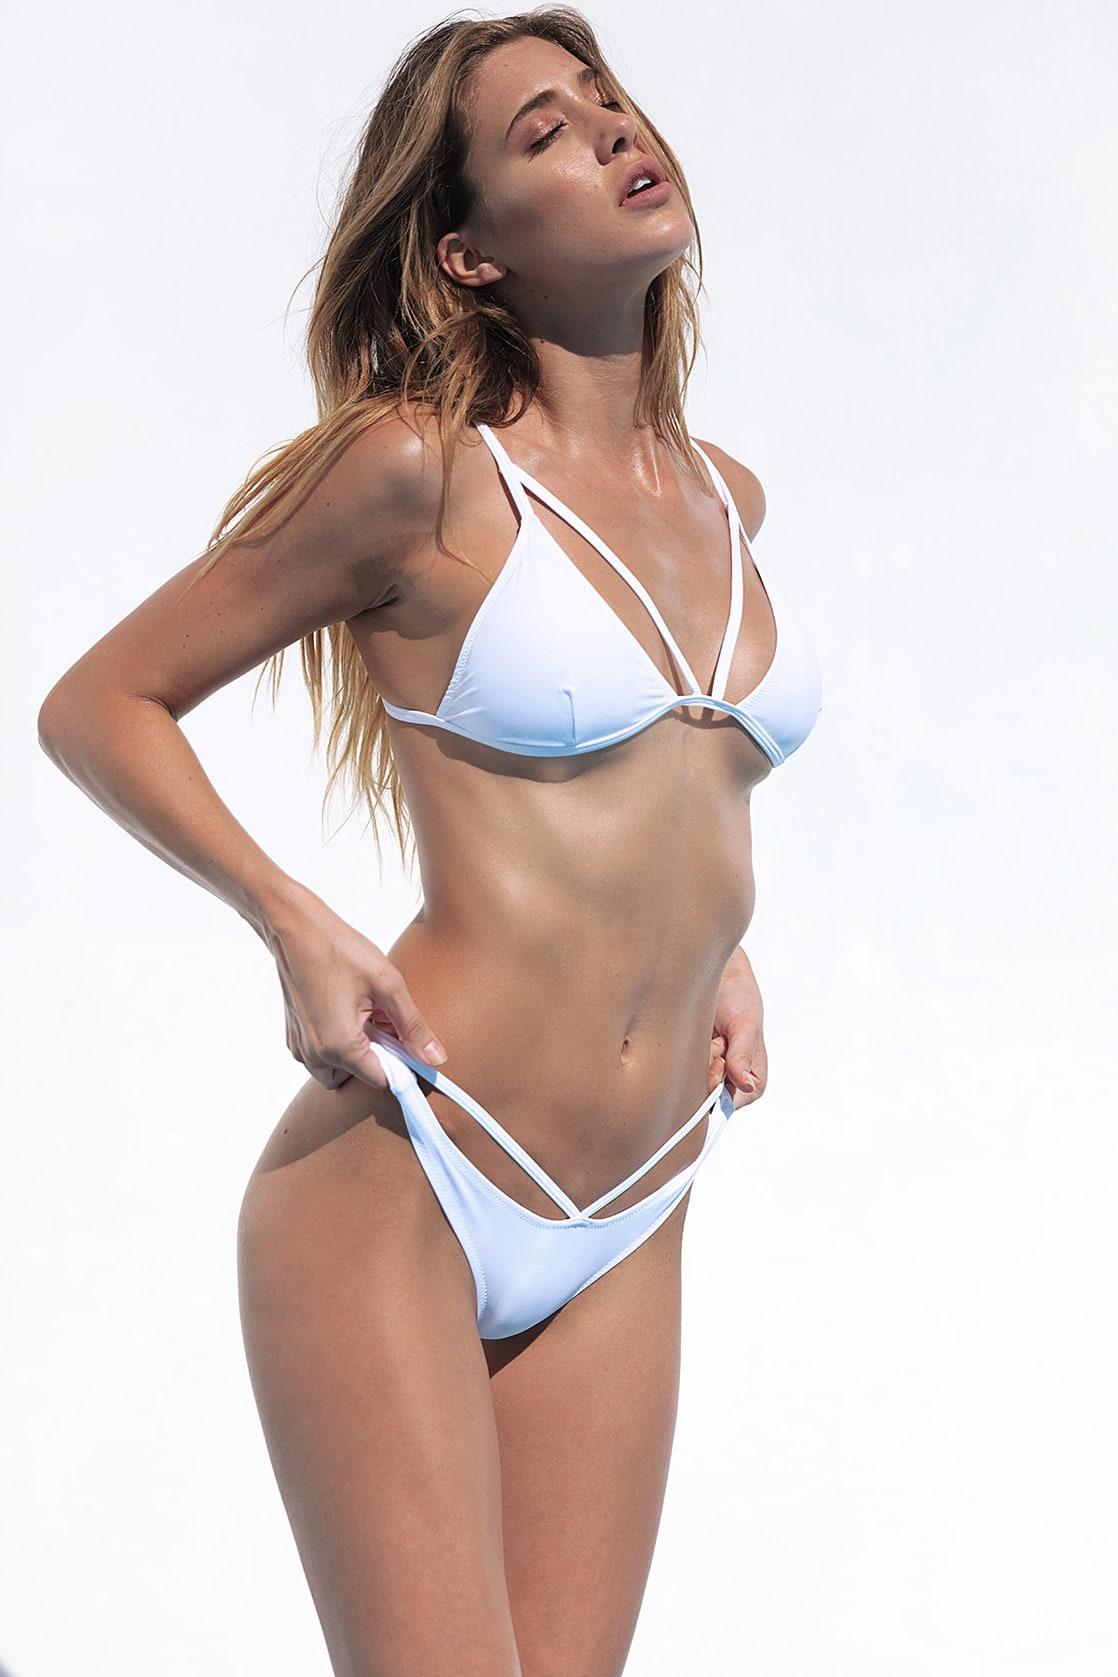 Hot Jessica Serfaty nude (83 photo), Sexy, Sideboobs, Instagram, cleavage 2015